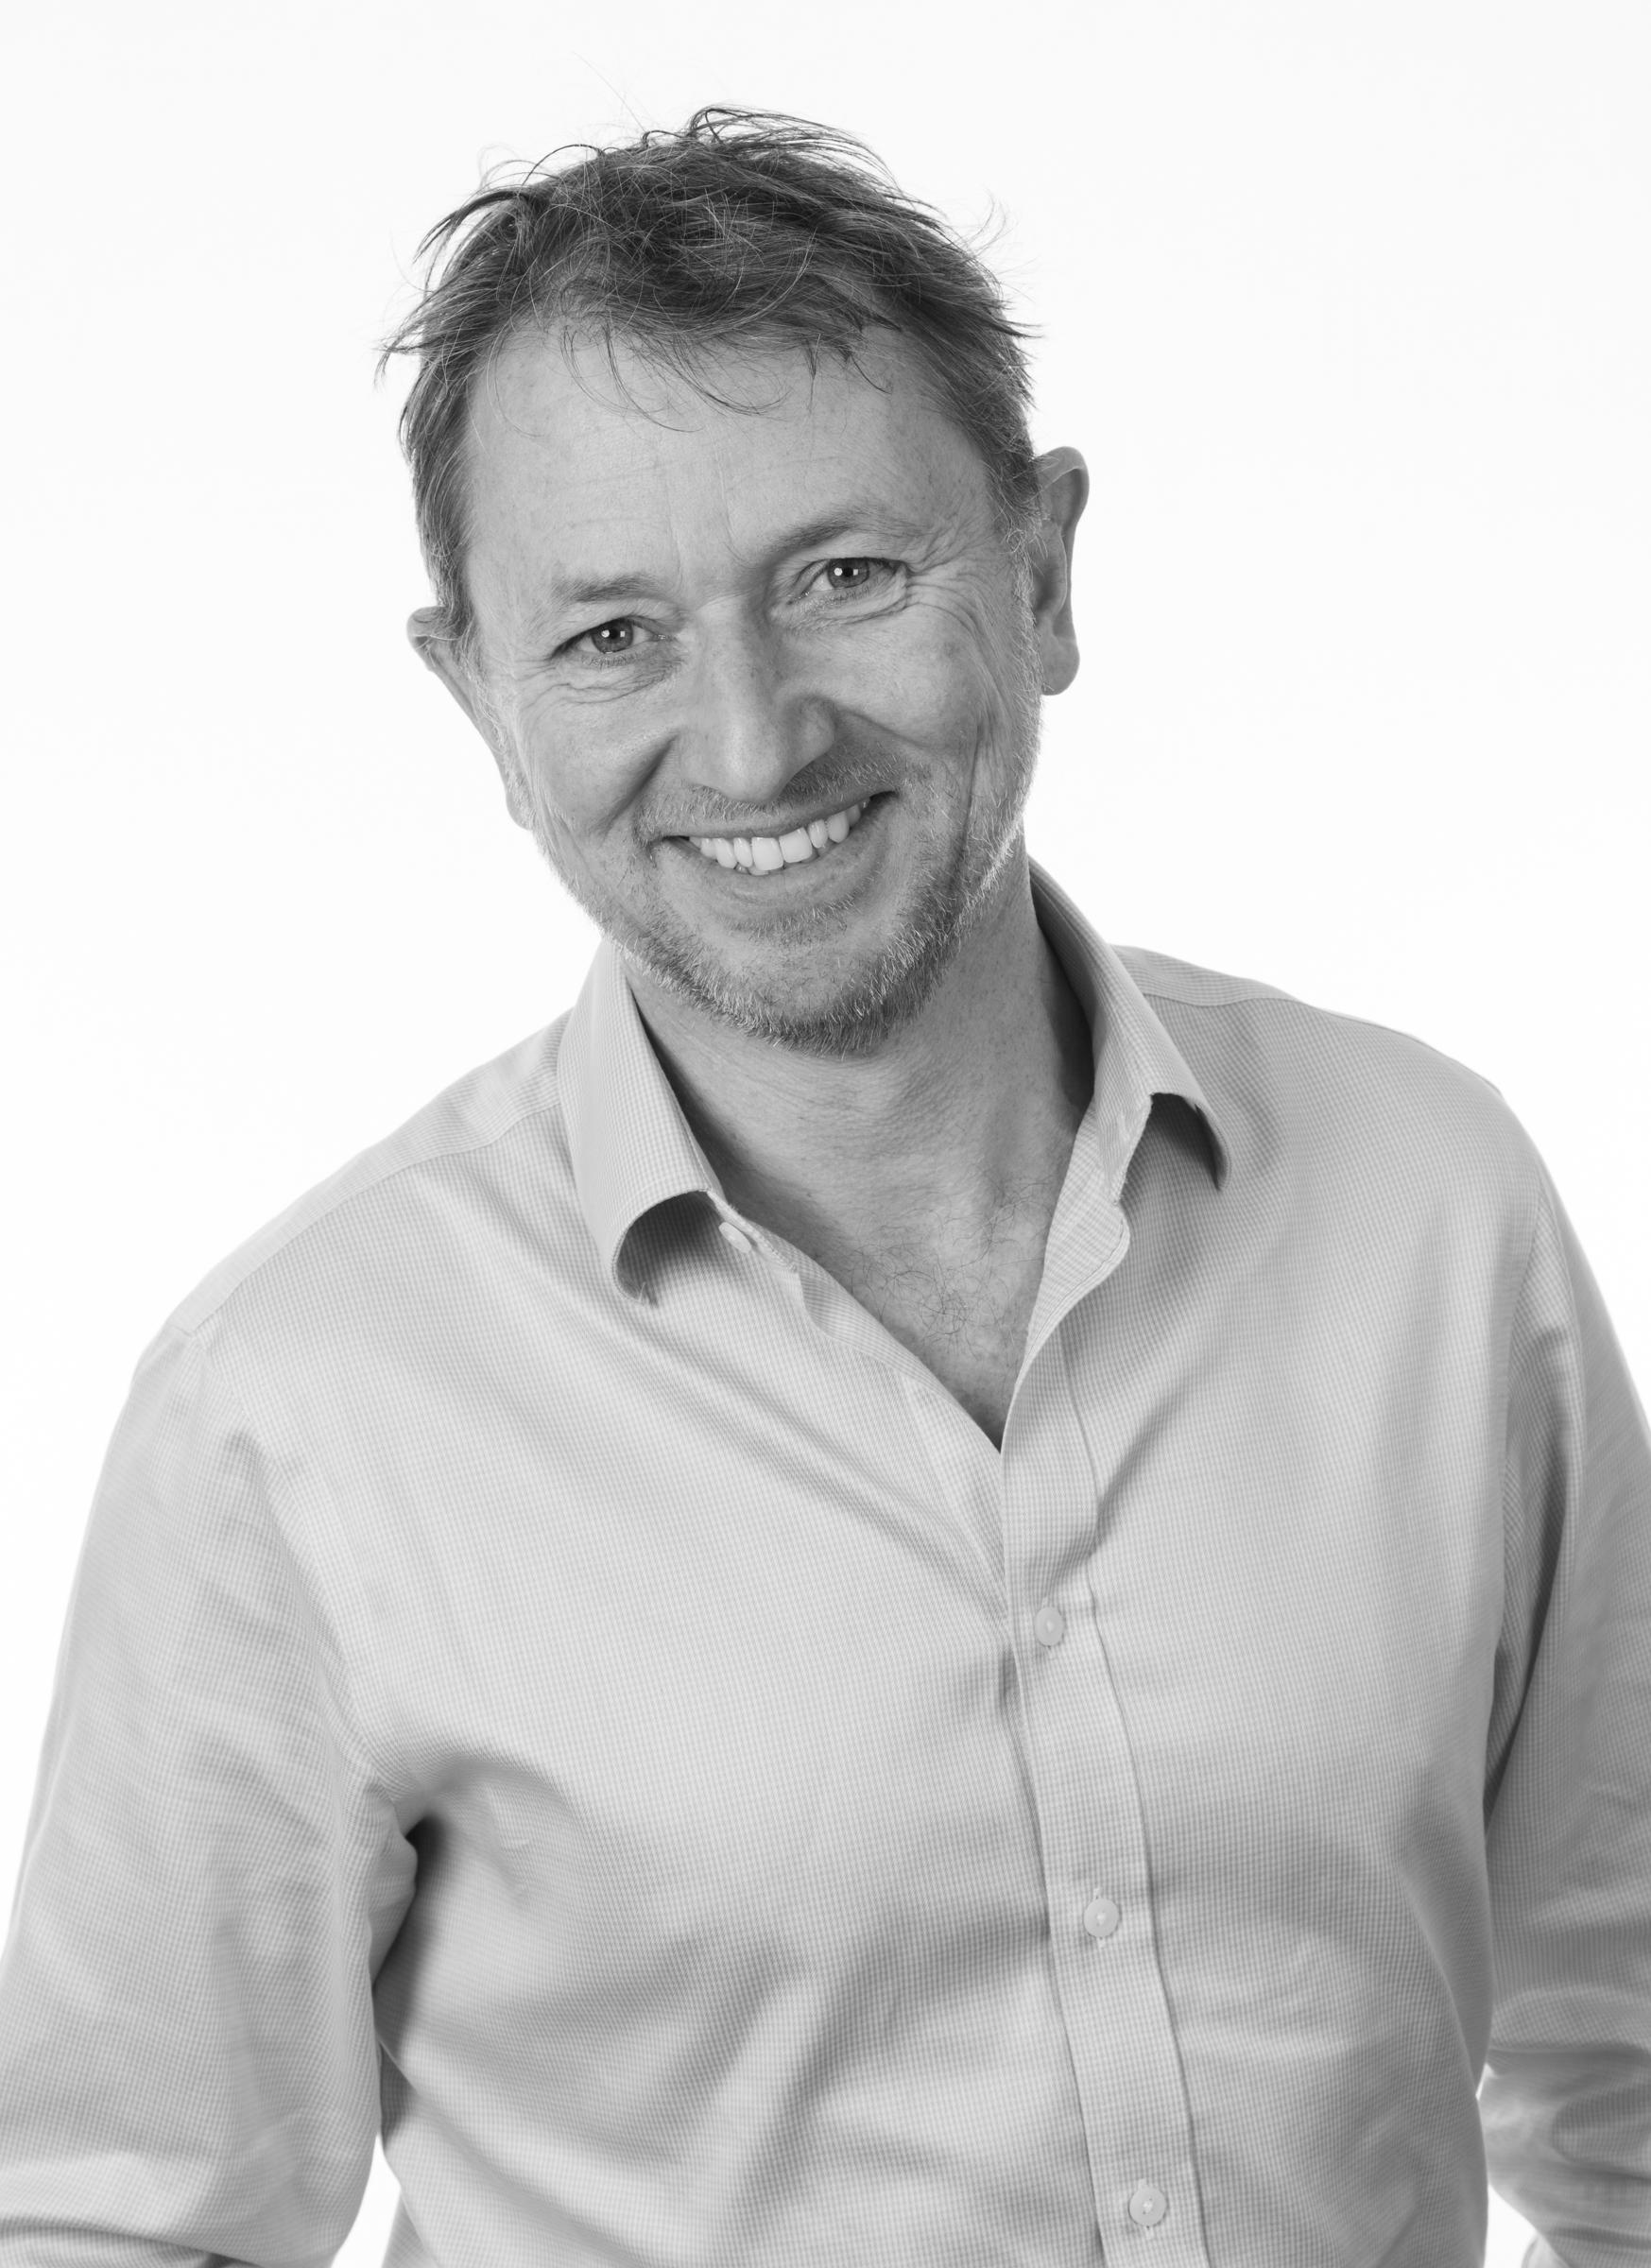 Tim Cross